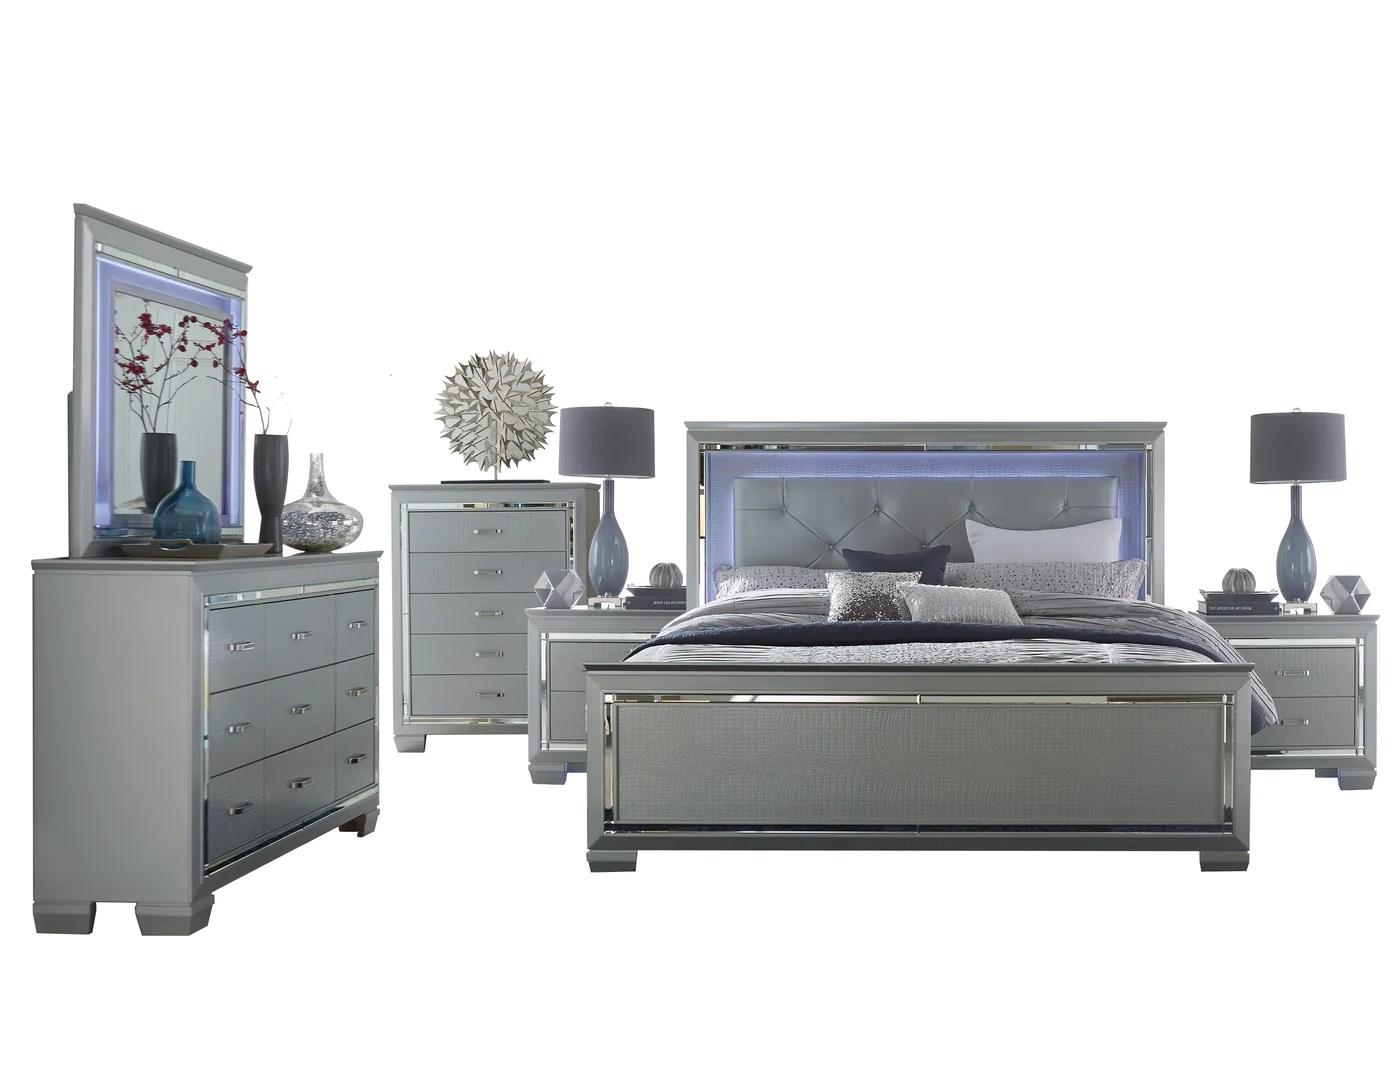 almada 6pc bedroom set full led bed dresser mirror 2 nightstand chest in silver alligator embossed